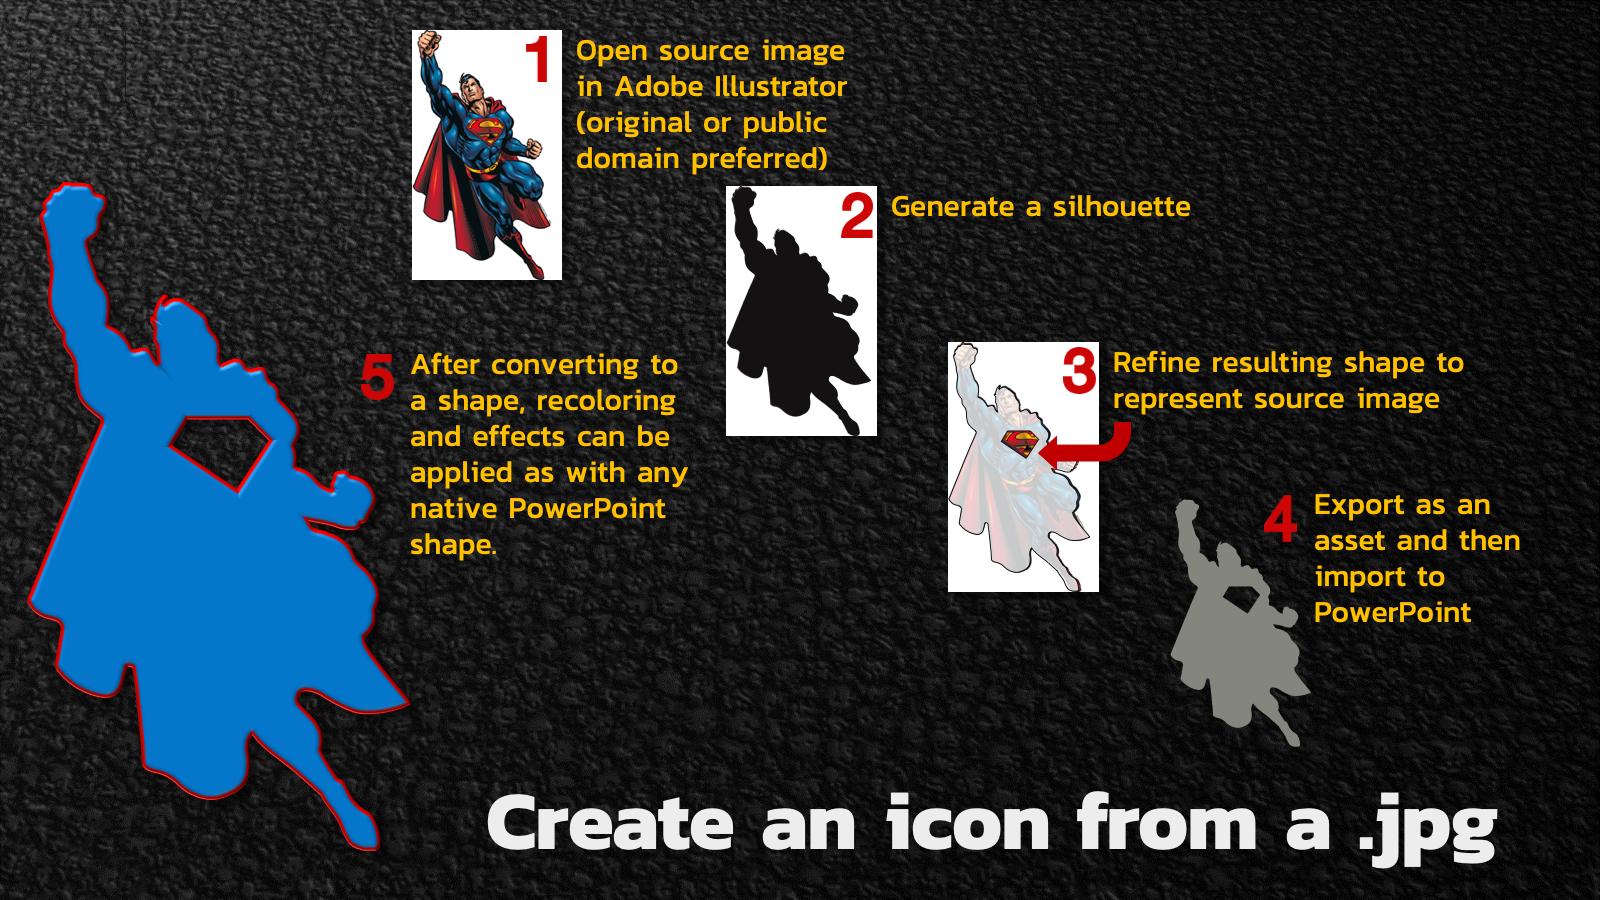 Generating custom icons